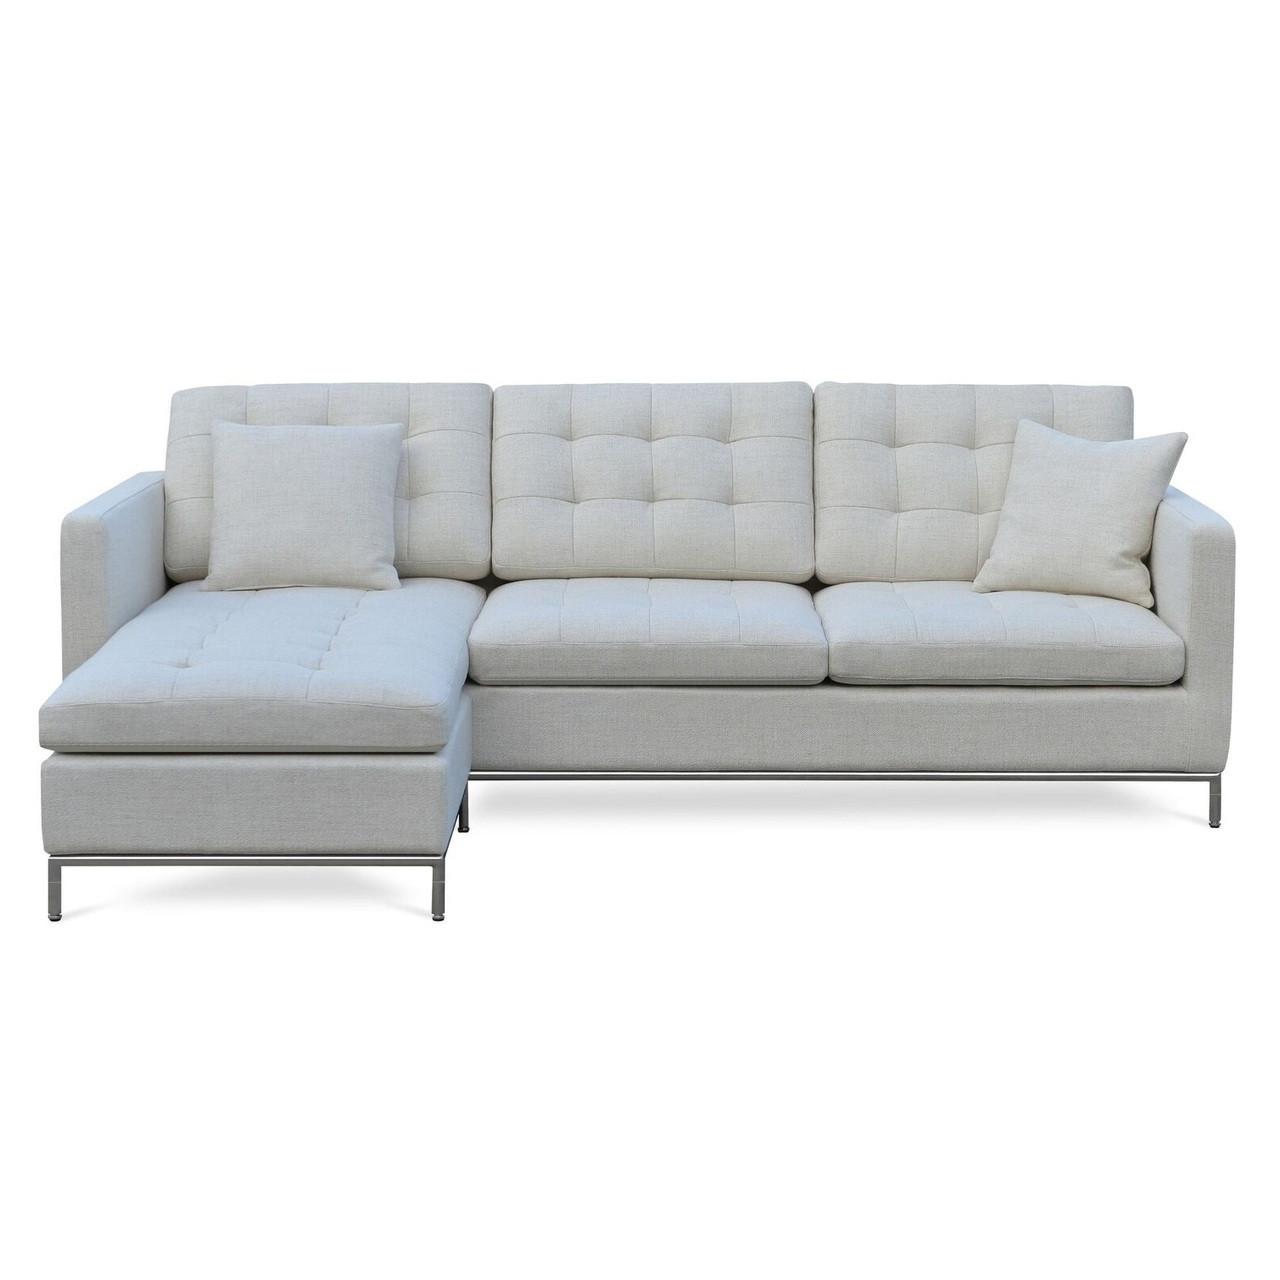 Brilliant Taxim Modular Sectional Sofa 94 Download Free Architecture Designs Scobabritishbridgeorg